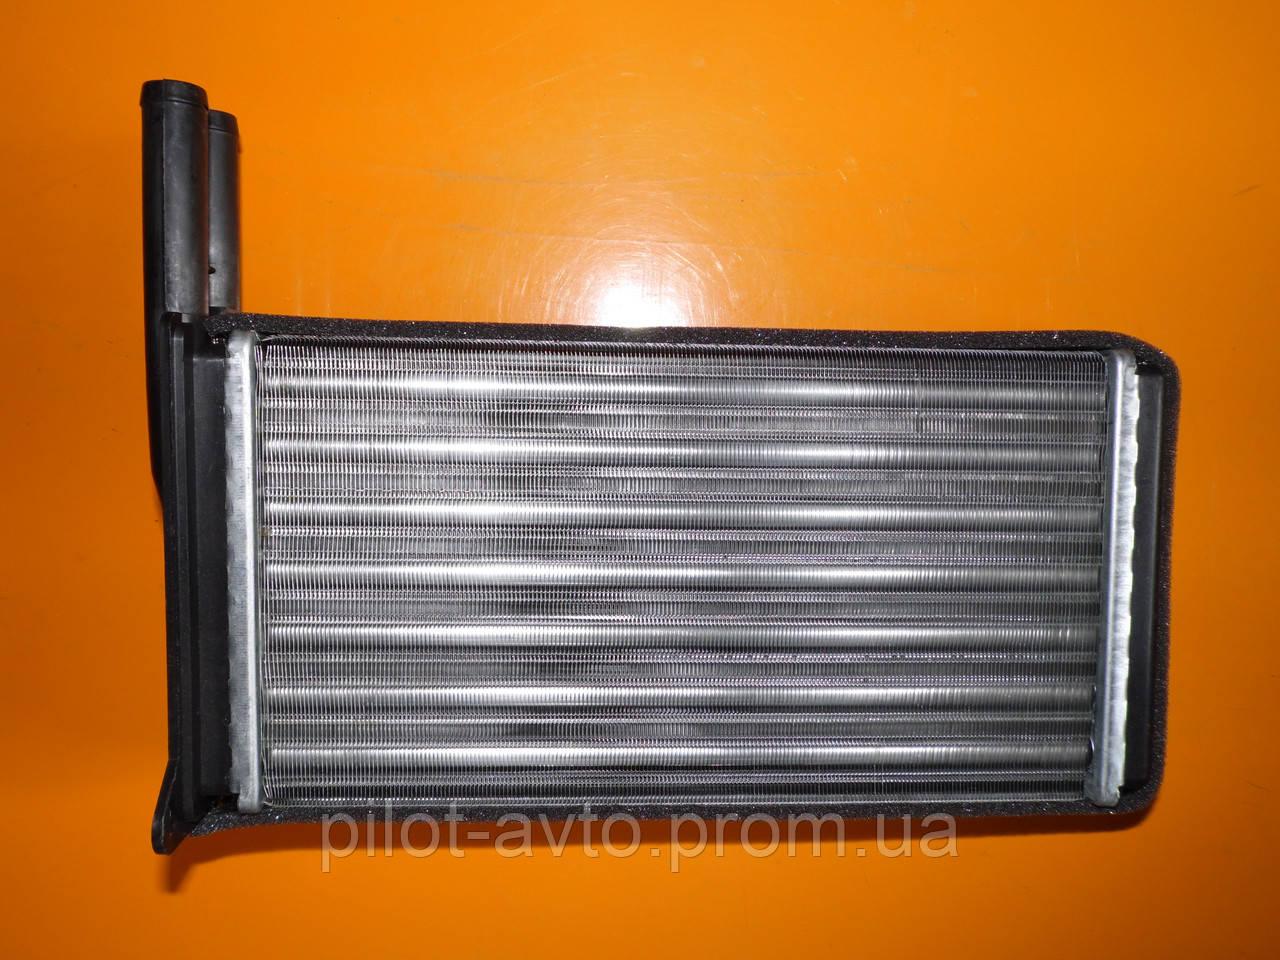 радиатор polcar ford sierra